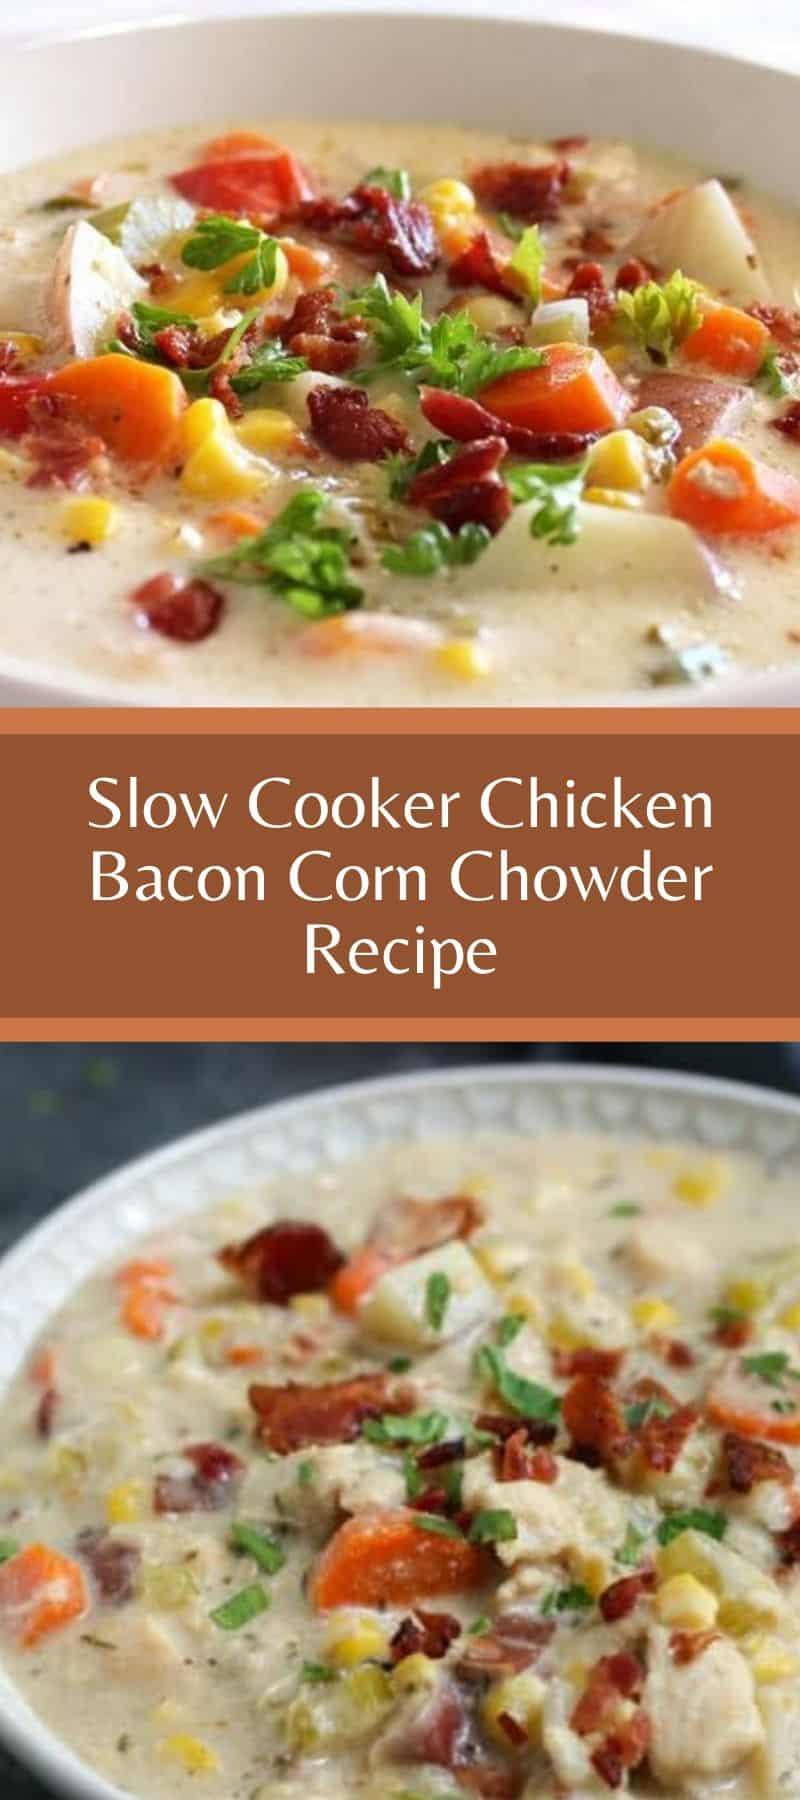 Slow Cooker Chicken Bacon Corn Chowder Recipe 3